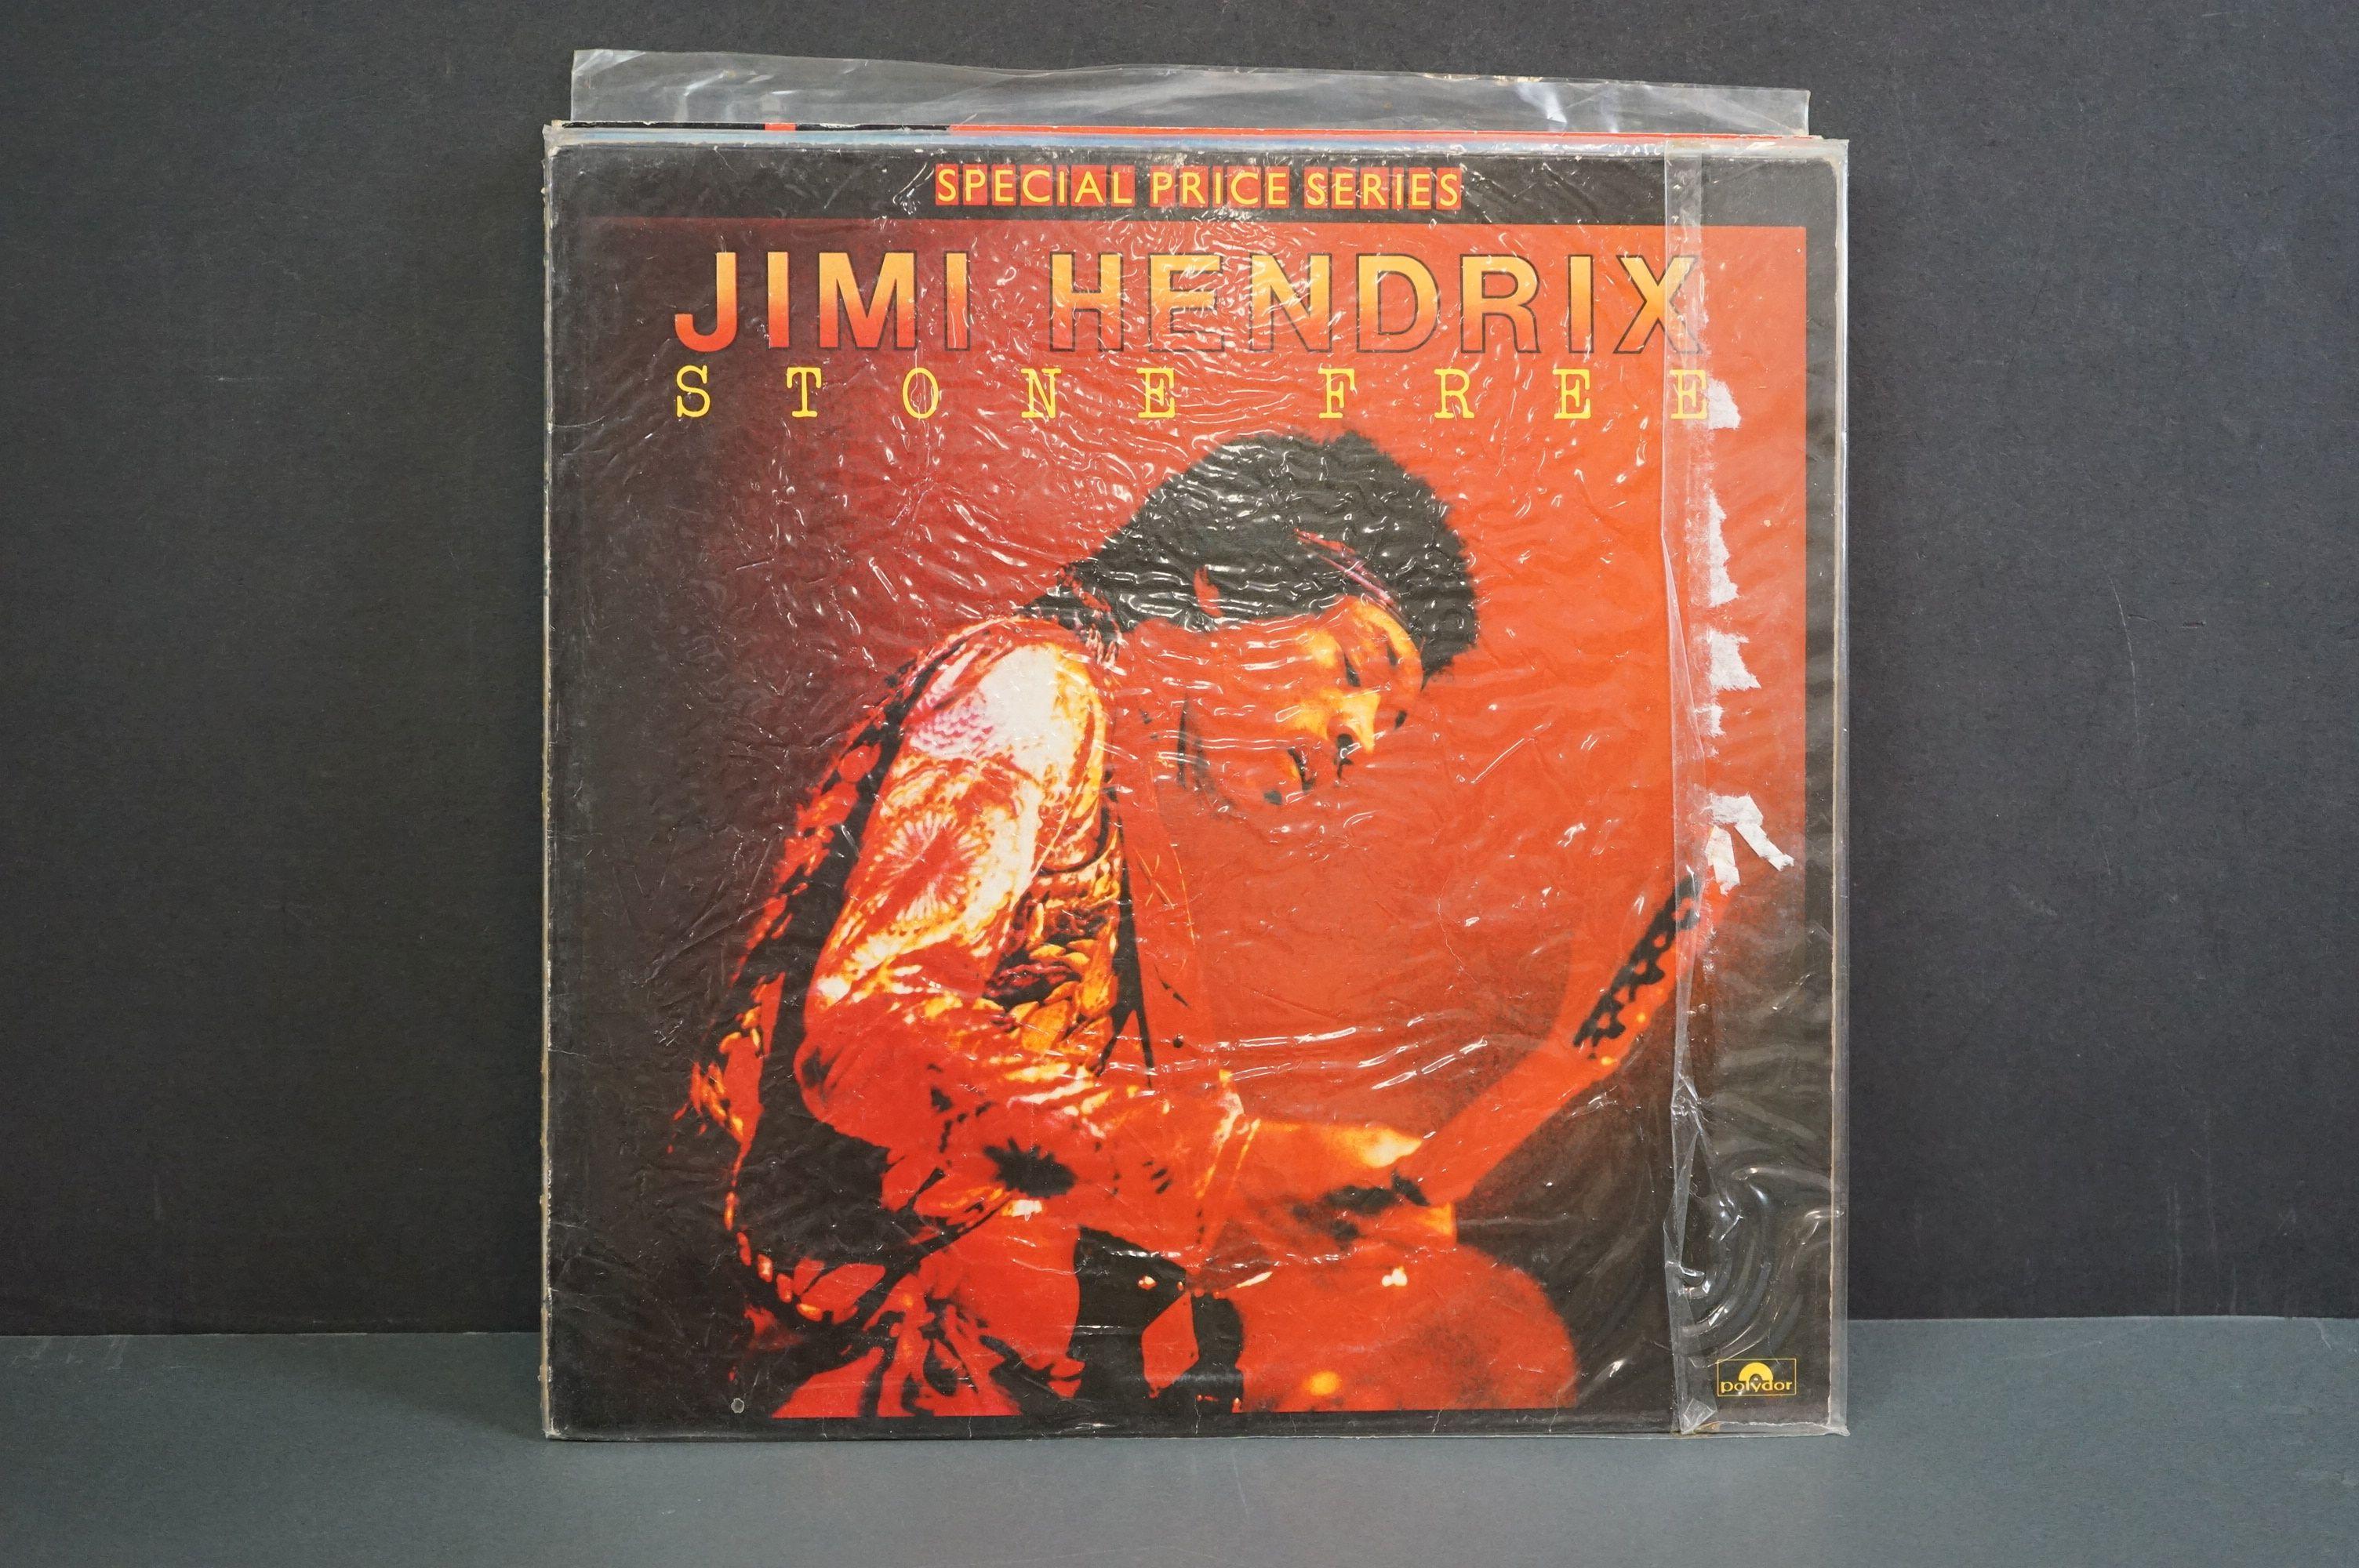 Vinyl - Nine Jimi Hendrix LPs to include Smash Hits, Hey Joe (Italian pressing), Stone Free, Jimi - Image 4 of 9